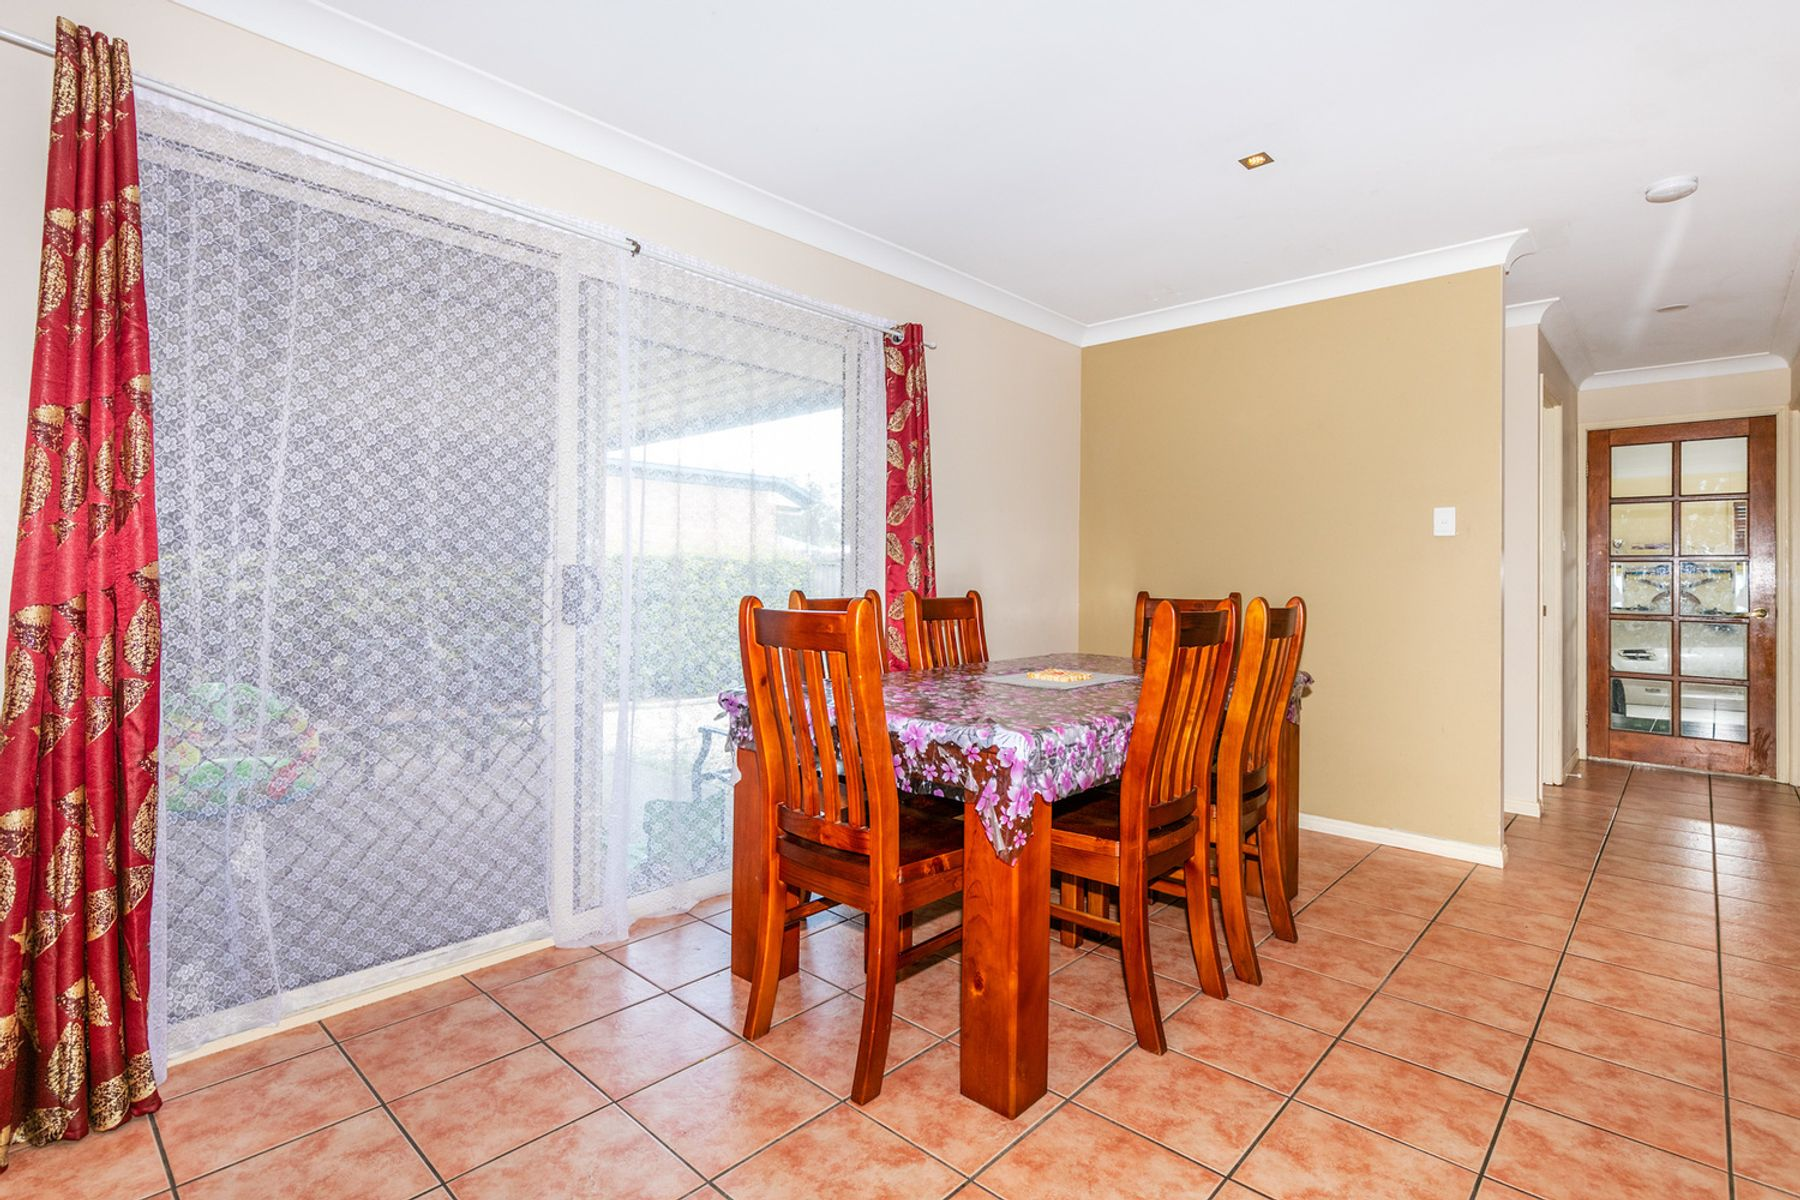 2 Shamrock Street, Crestmead, QLD 4132